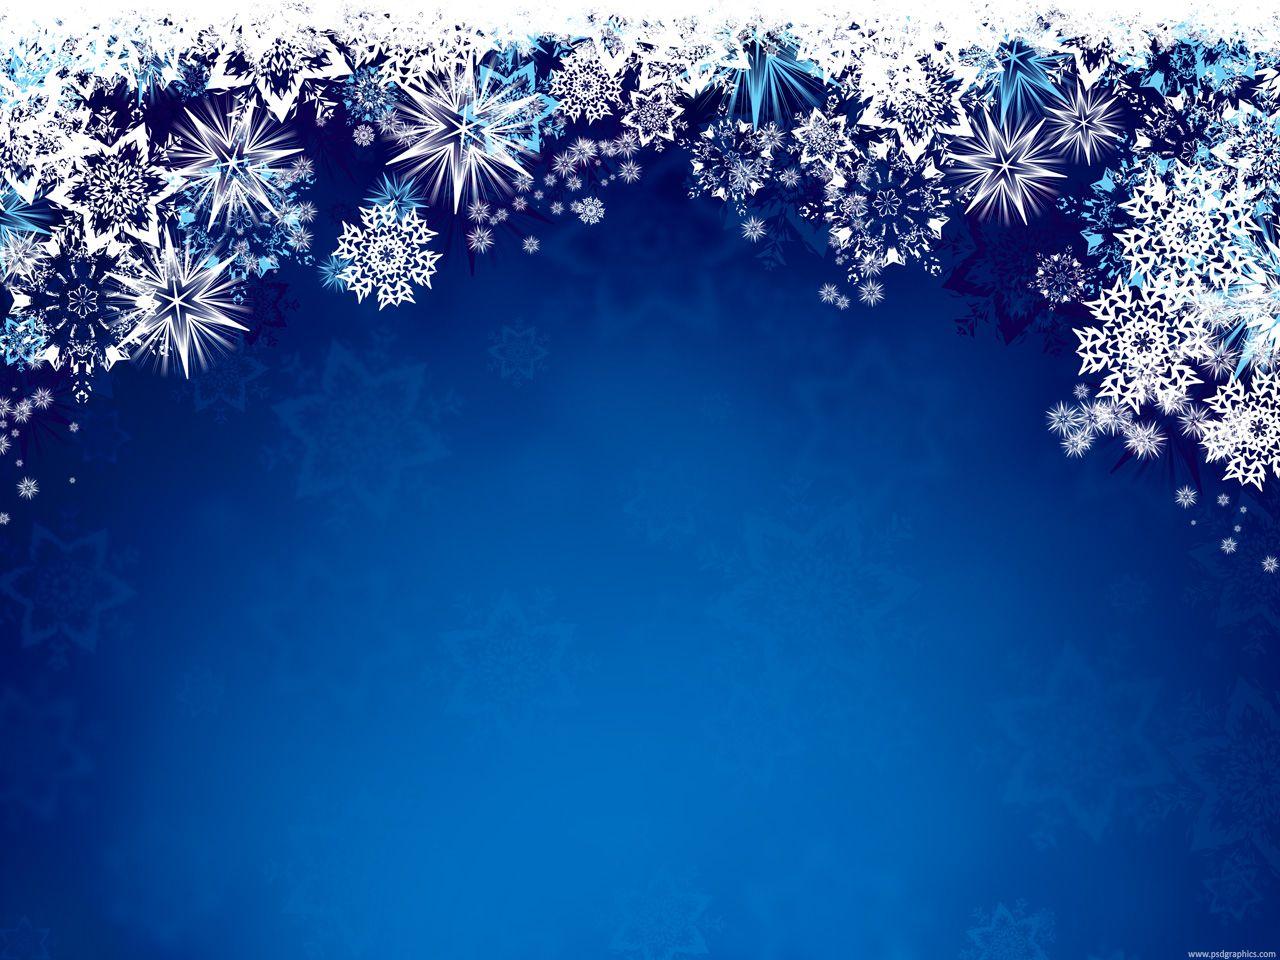 Blue Winter Wonderland Christmas Border Clipart.